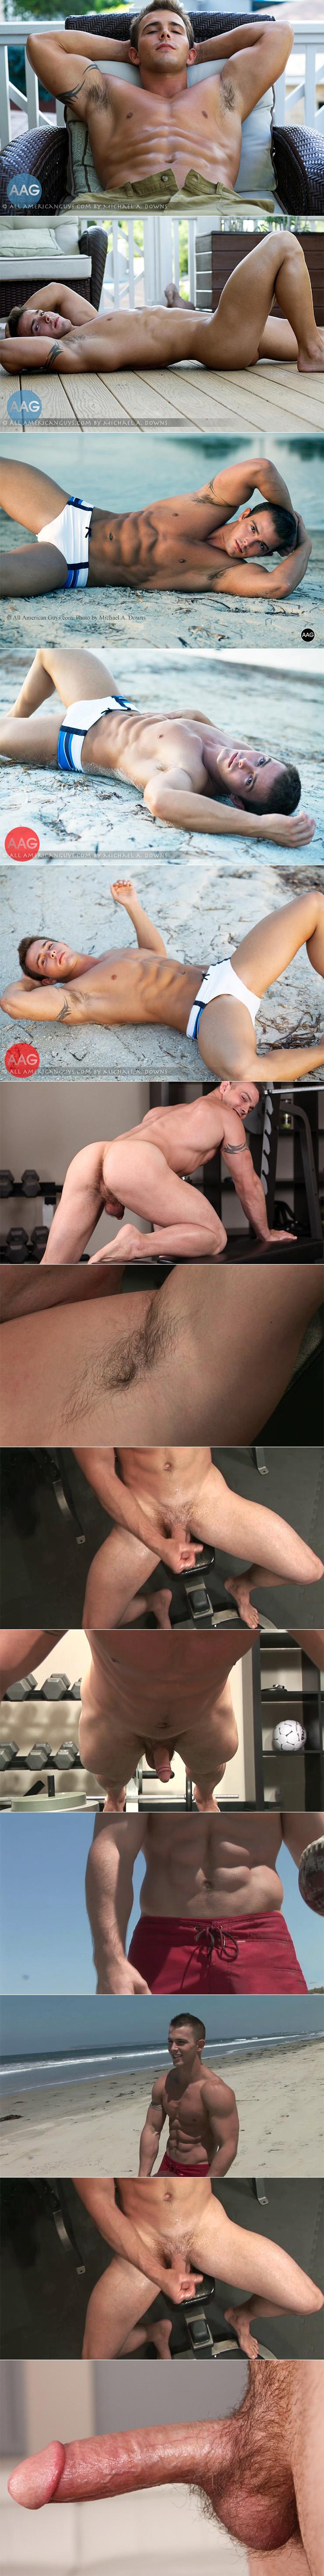 Sean Cody Wade aka Tory George aka Ian Turner Solo Masturbation Scene Male Feet Closeup Hairy Asshole & Cock 2